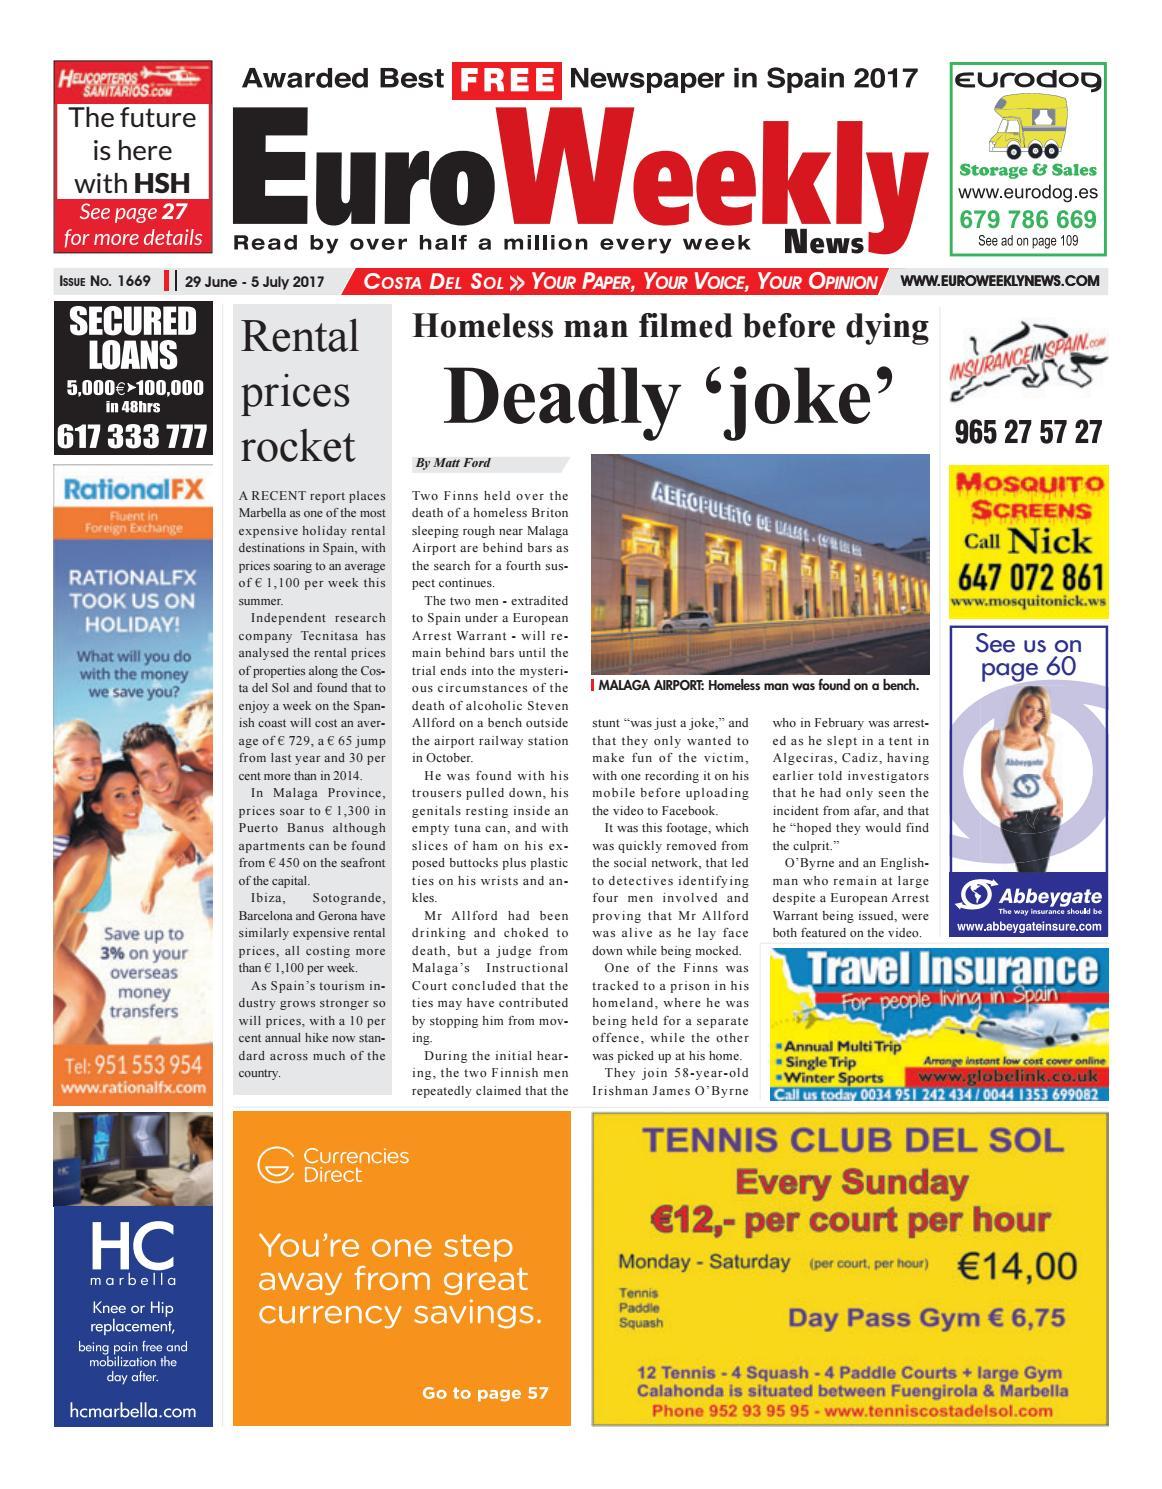 Euro Weekly News Costa Del Sol 3 9 November 2016 Issue 1635 By  # Muebles Fenda Murcia